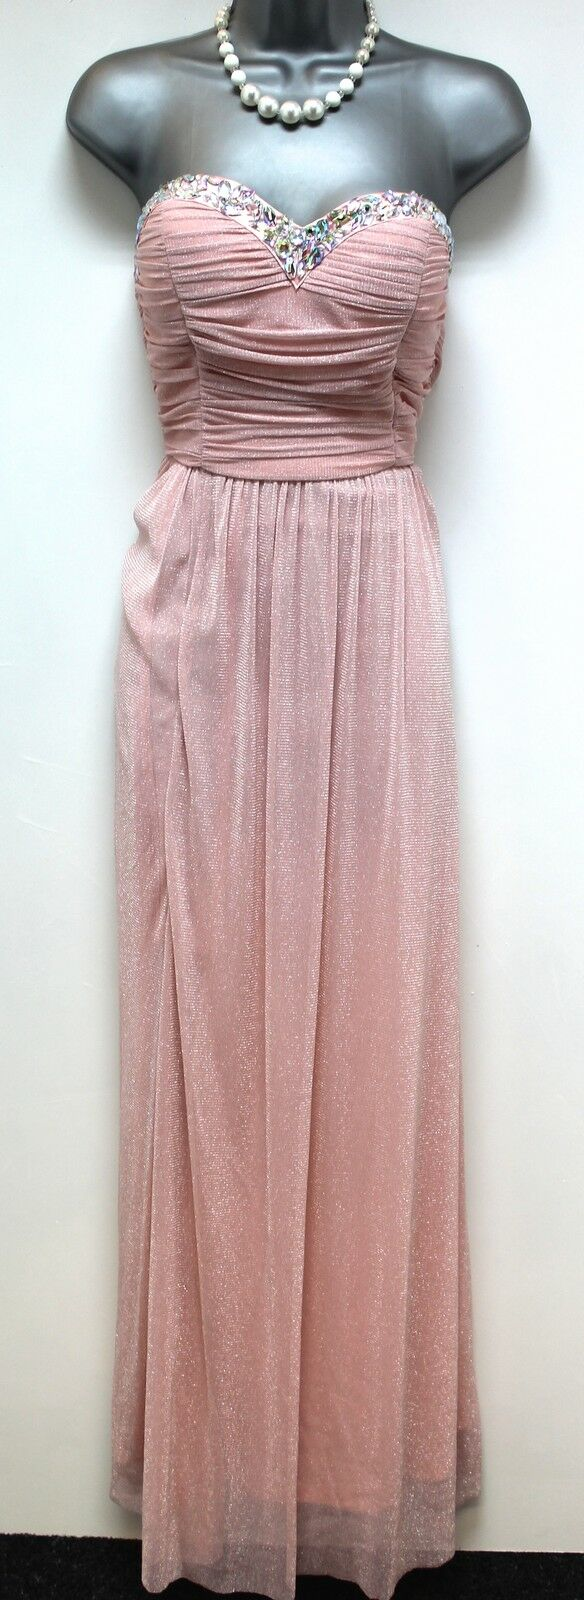 Stunning Quiz Pink Glitter Embellished Prom Evening Occasion Dress 10